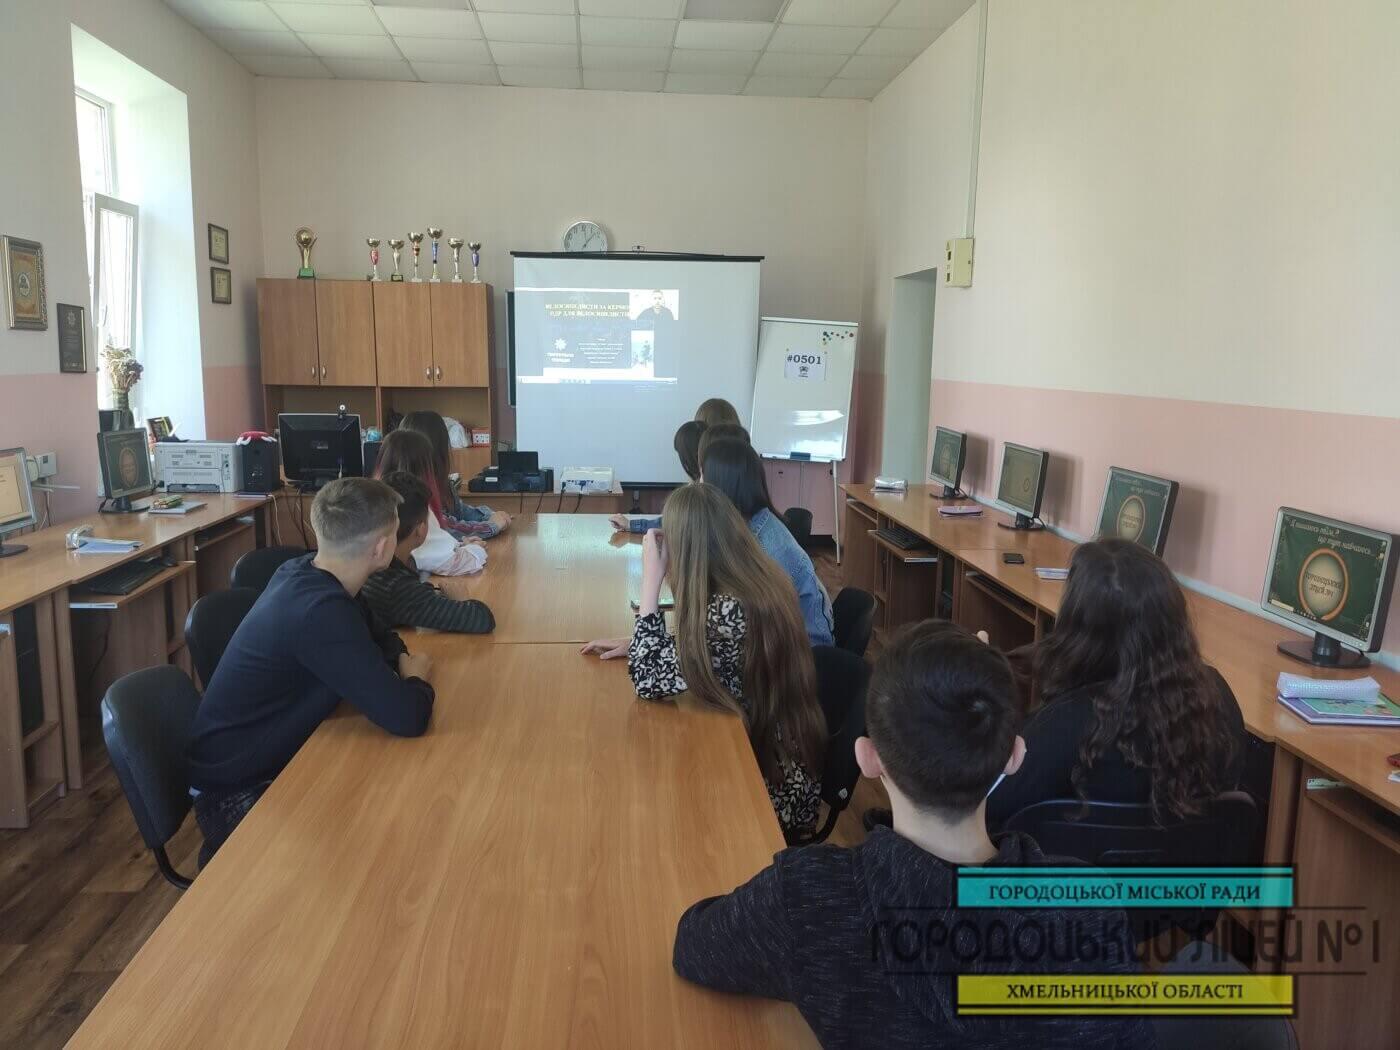 img 20210511 131235 1400x1050 - ІІ етап Всеукраїнського змагання #Хештег_Марафон #SafetyChallenge